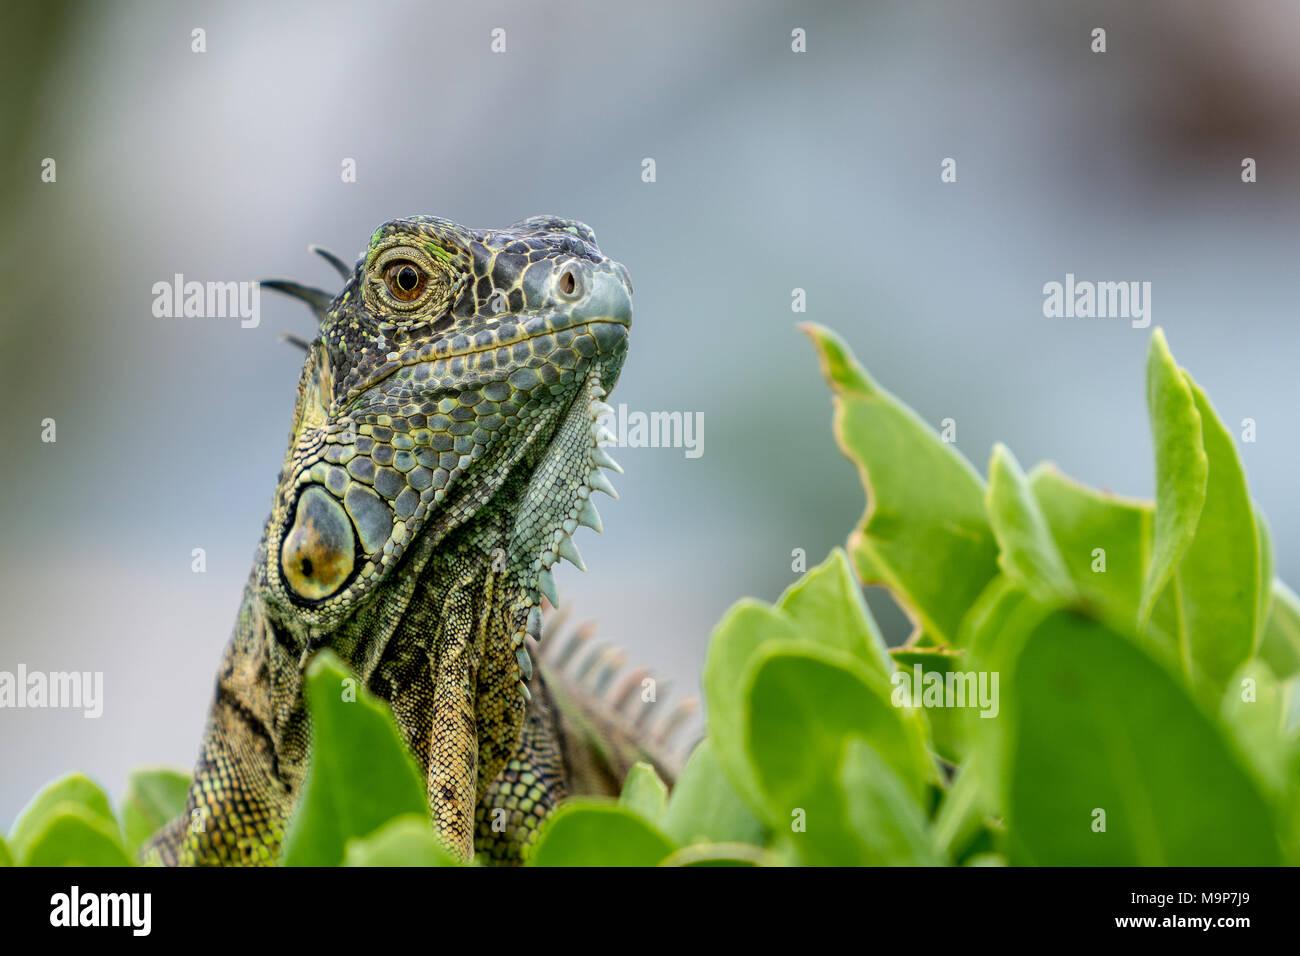 Lguanidae - Grand Cayman Stockbild